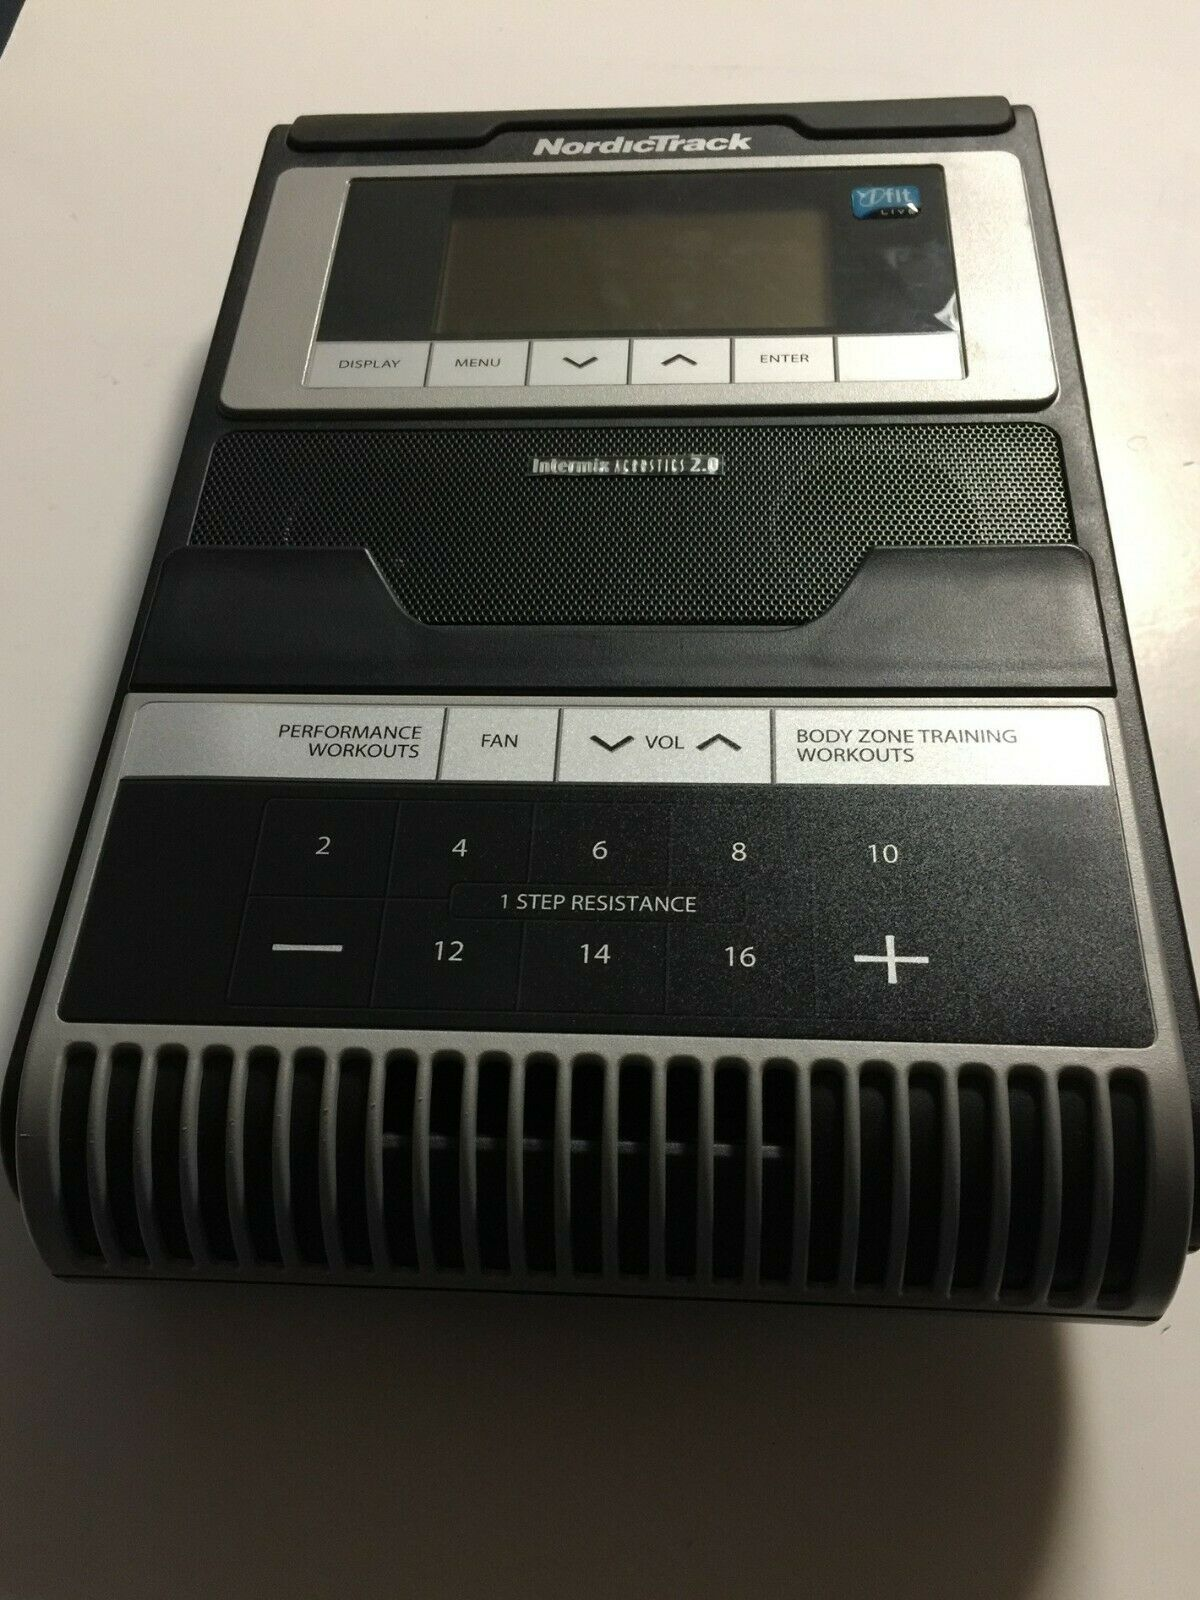 Nordictrack freestrider 30S elíptica Consola ntsr 013090 2908 11 290862 ESS12999